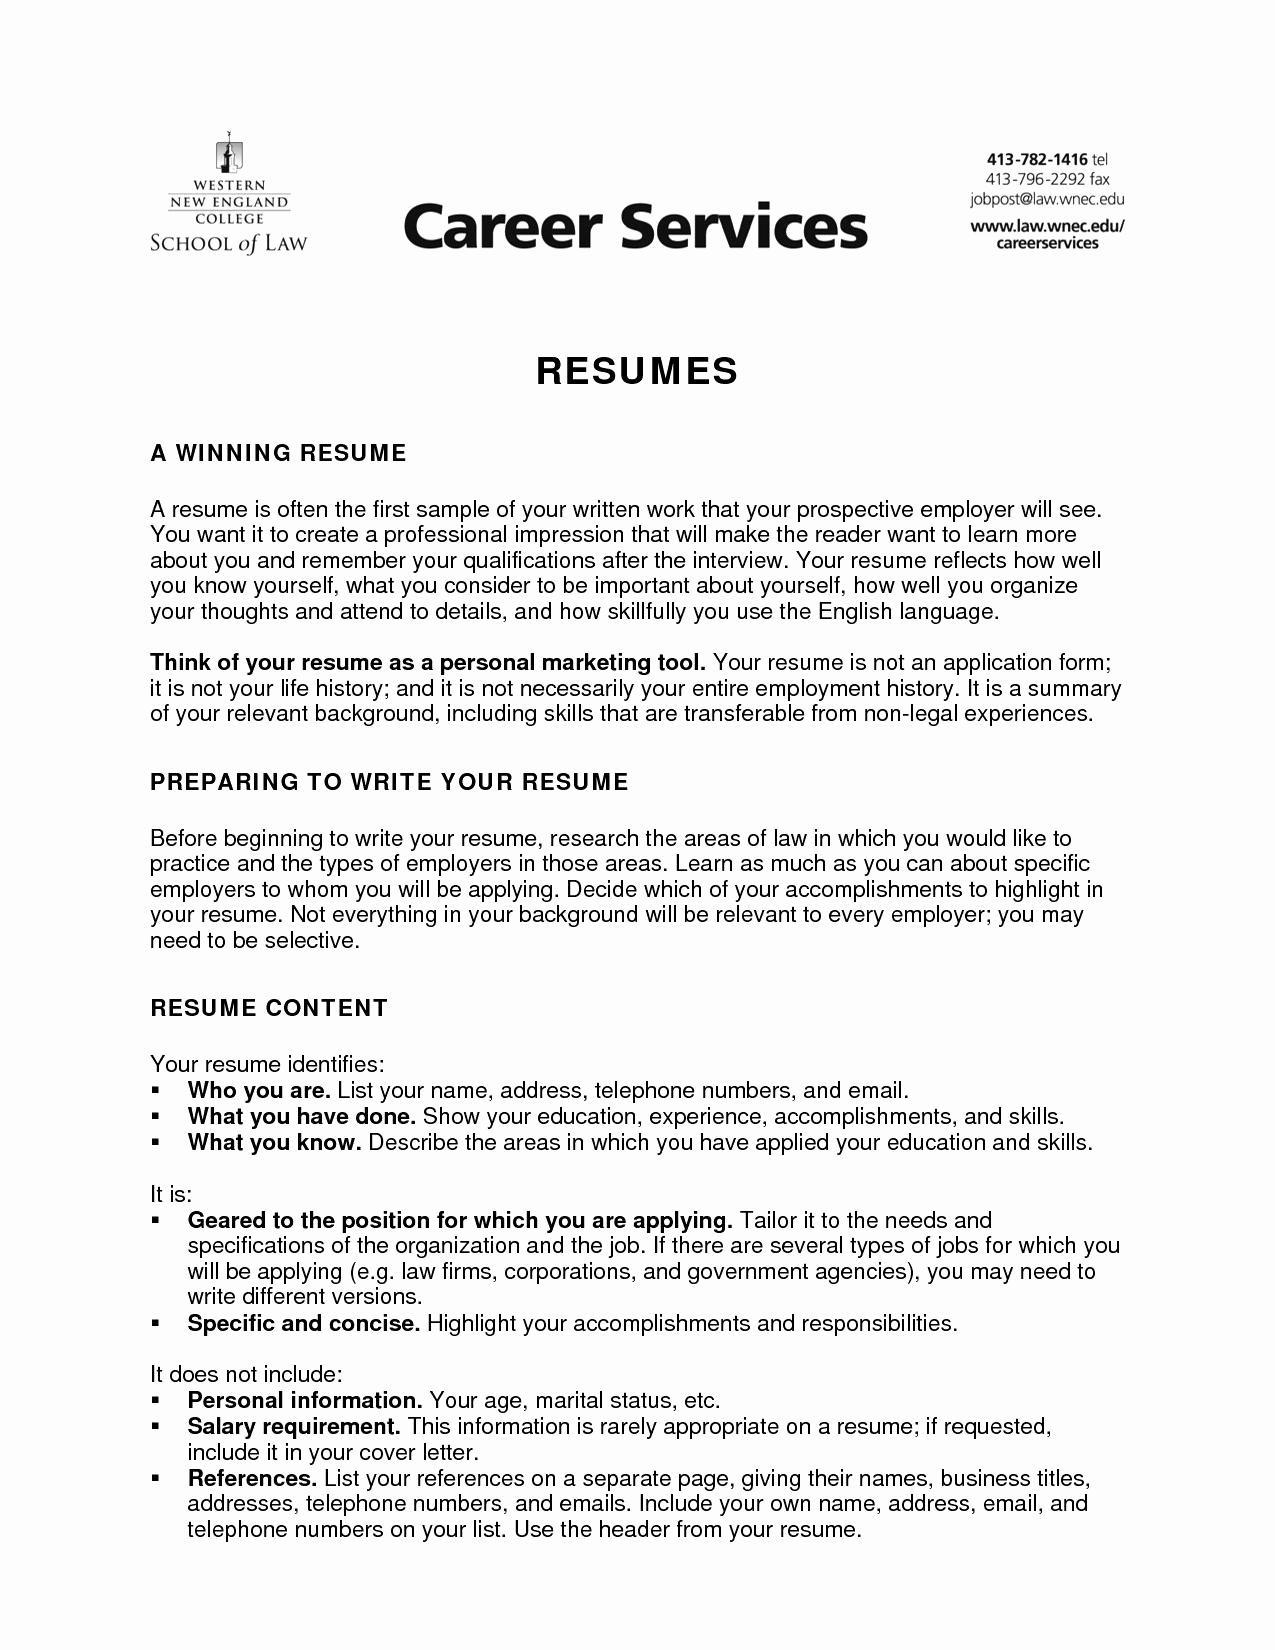 resume edge reviews